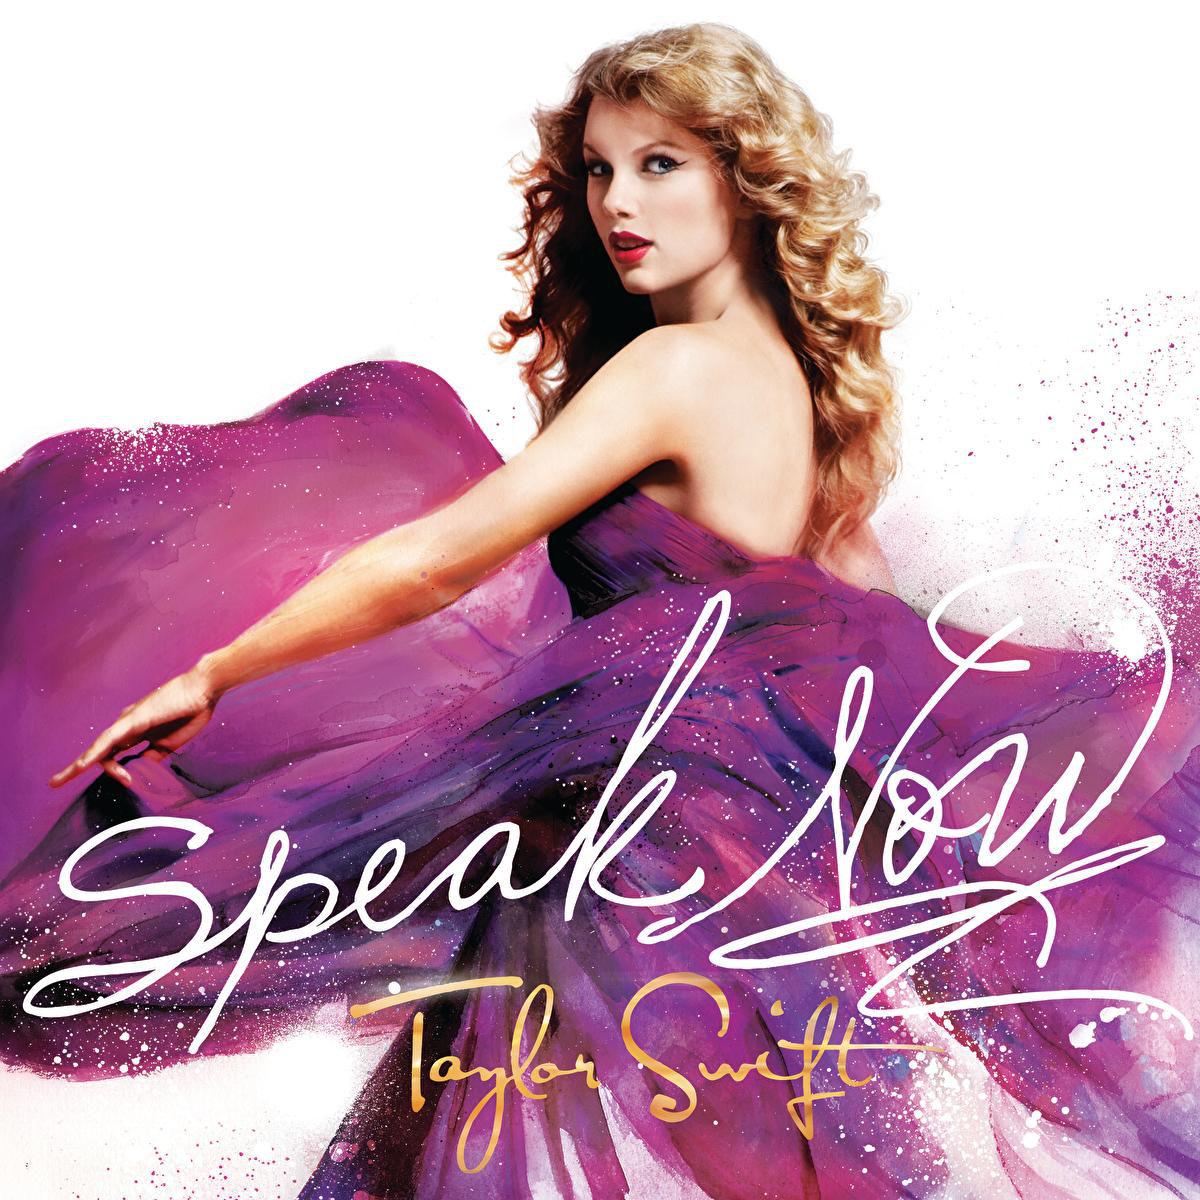 Speak Now by Taylor Swift (Big Machine Records, 2010)